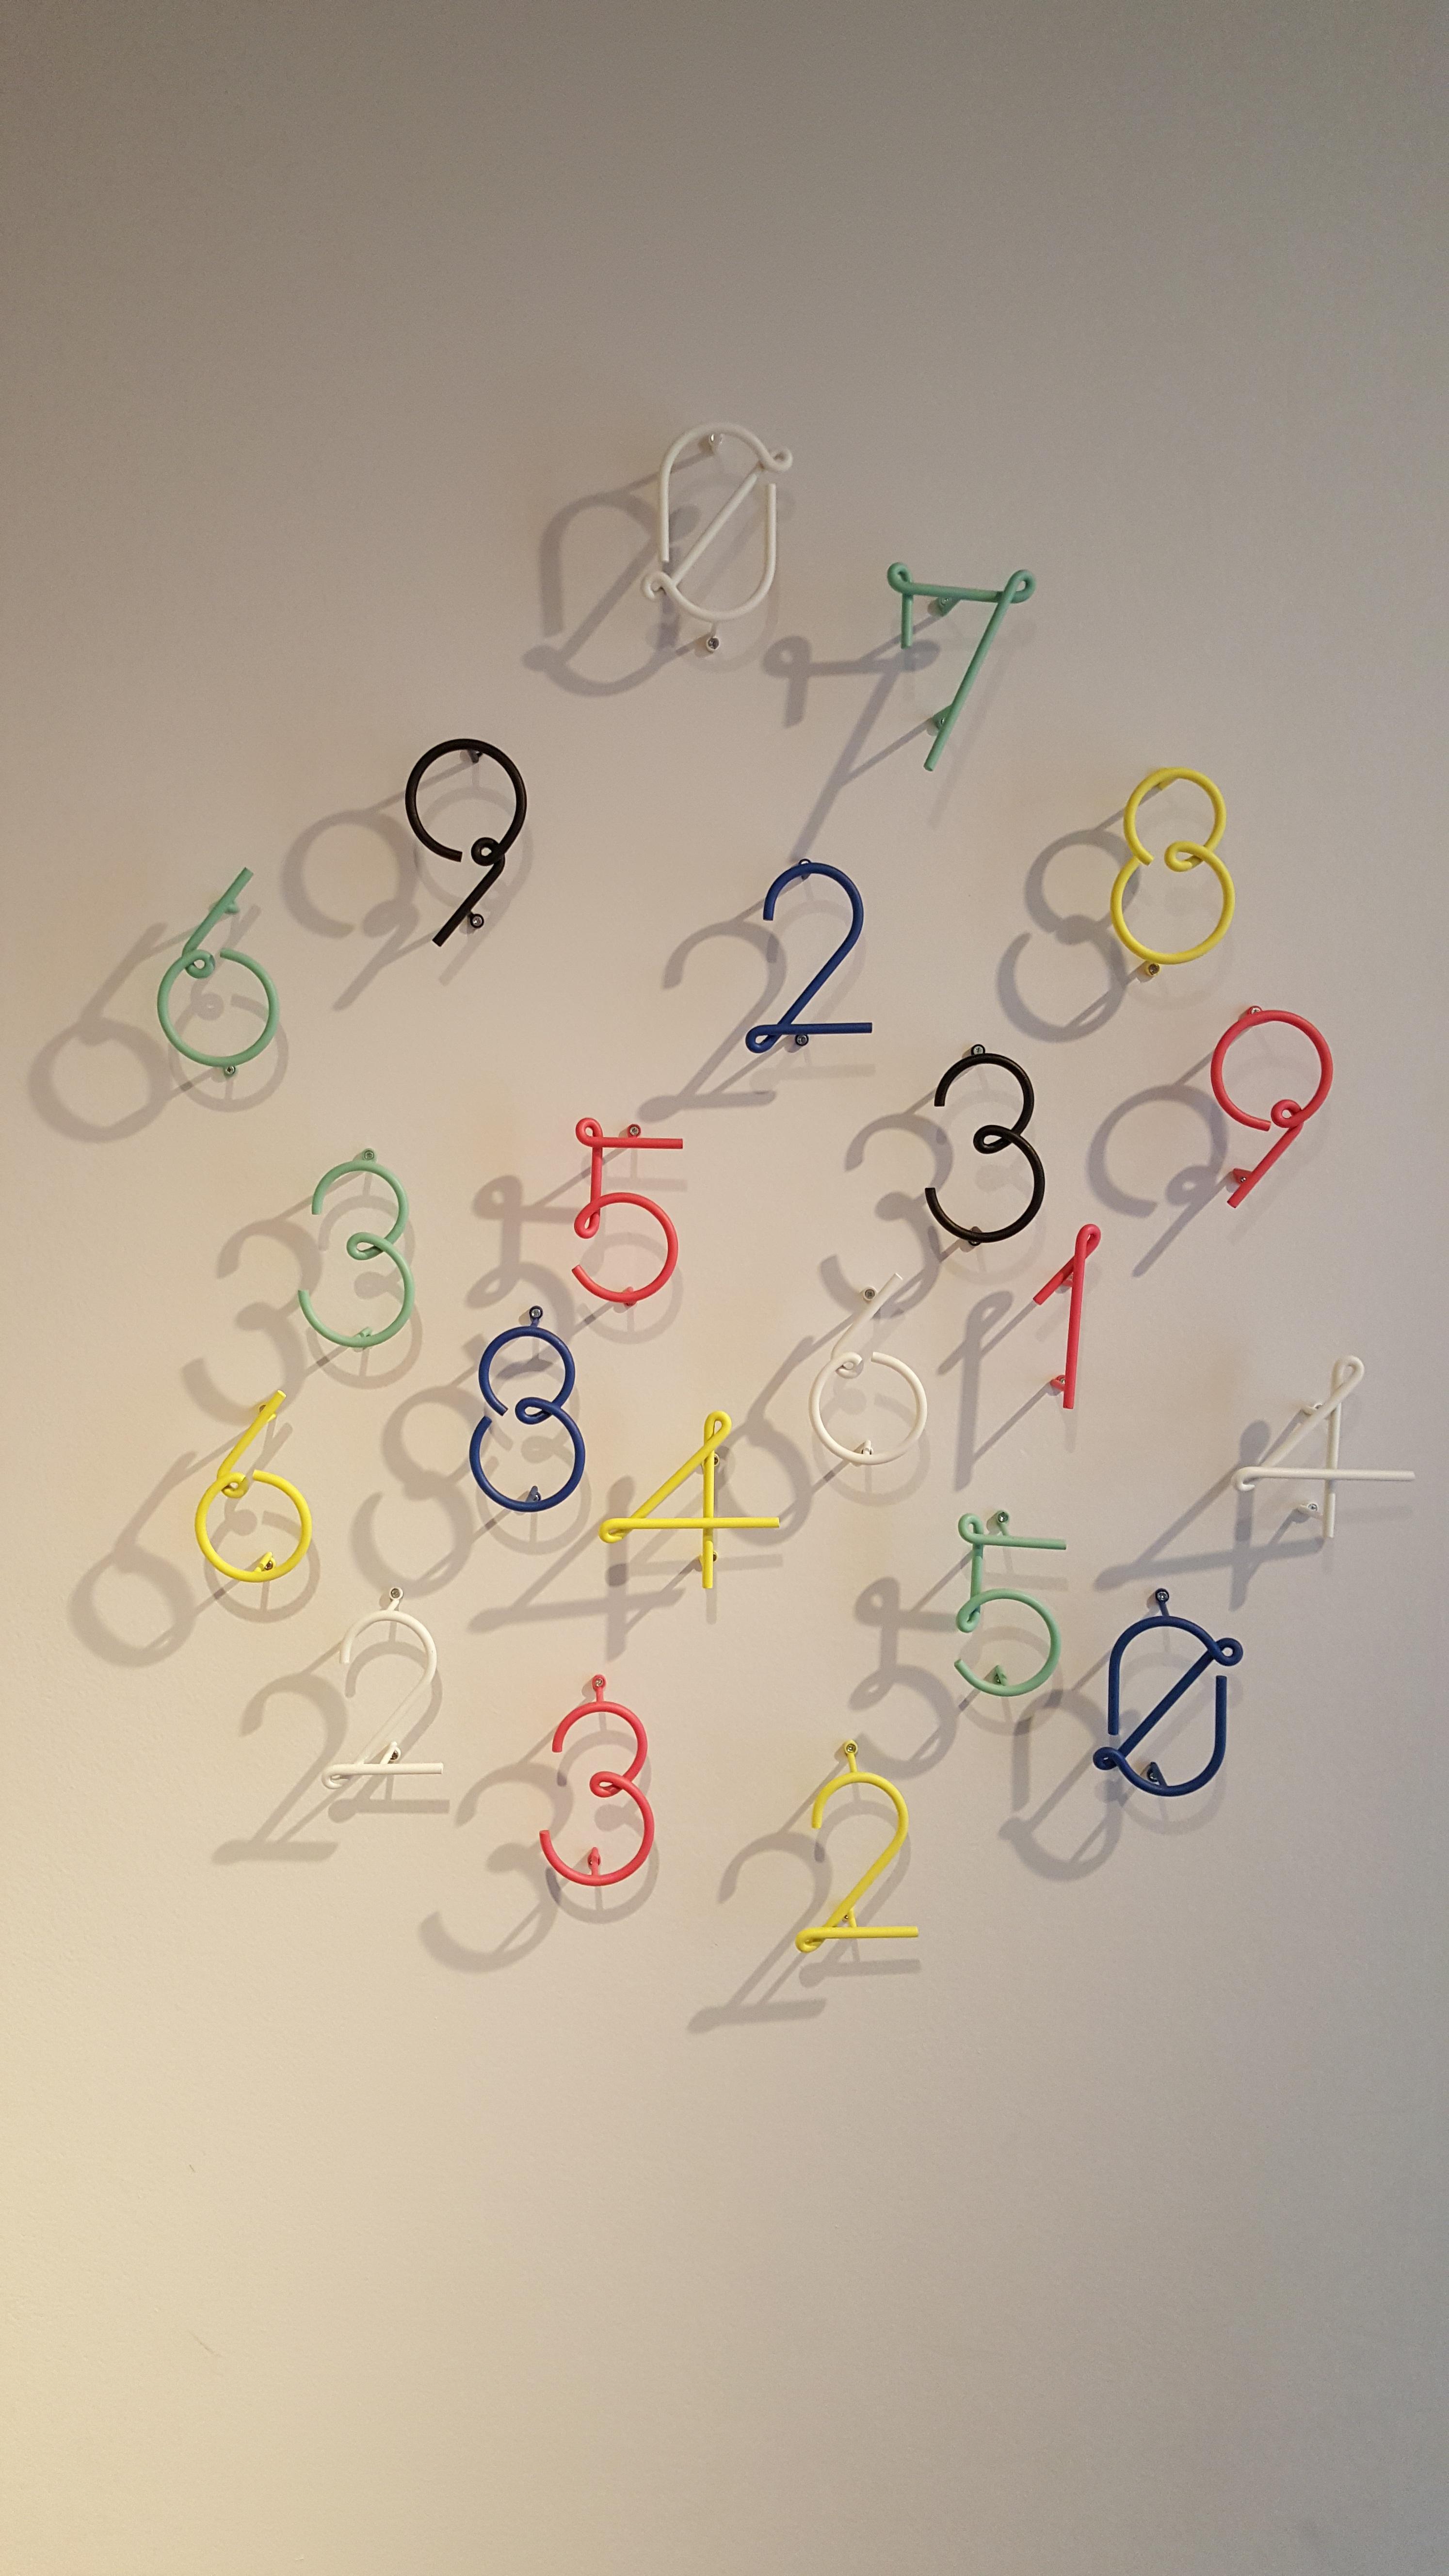 Gambar Jam Jumlah Dinding Warna Bayangan Lingkaran Fon